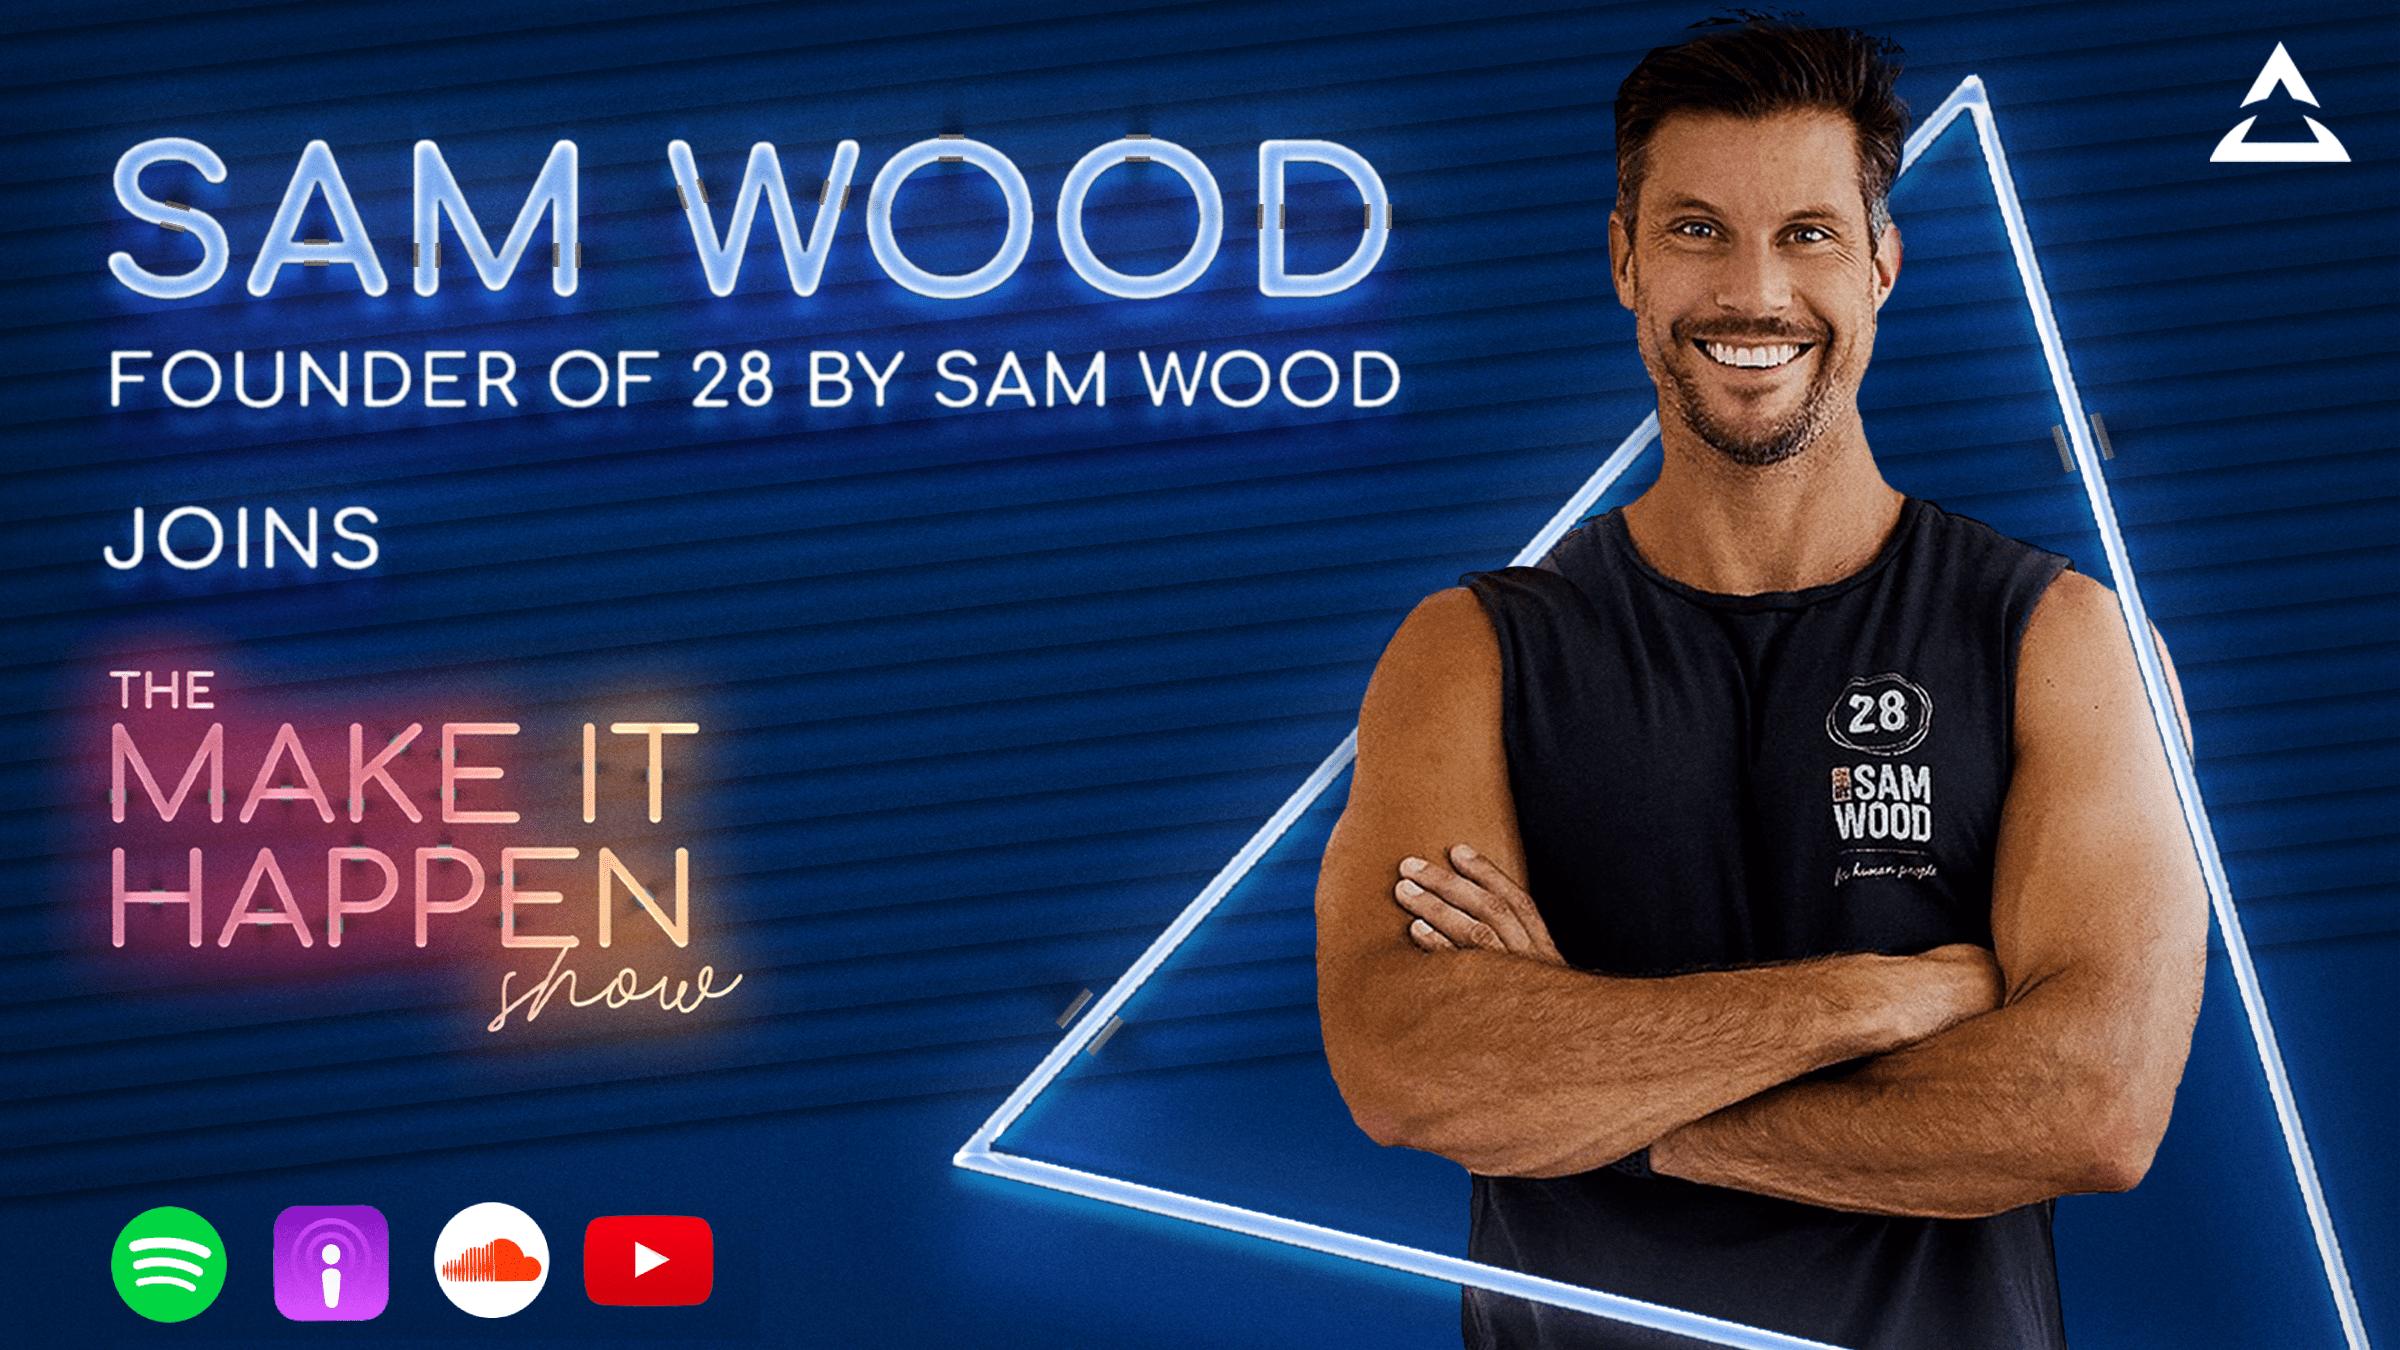 21. Sam Wood promotional image for The Make It Happen Show